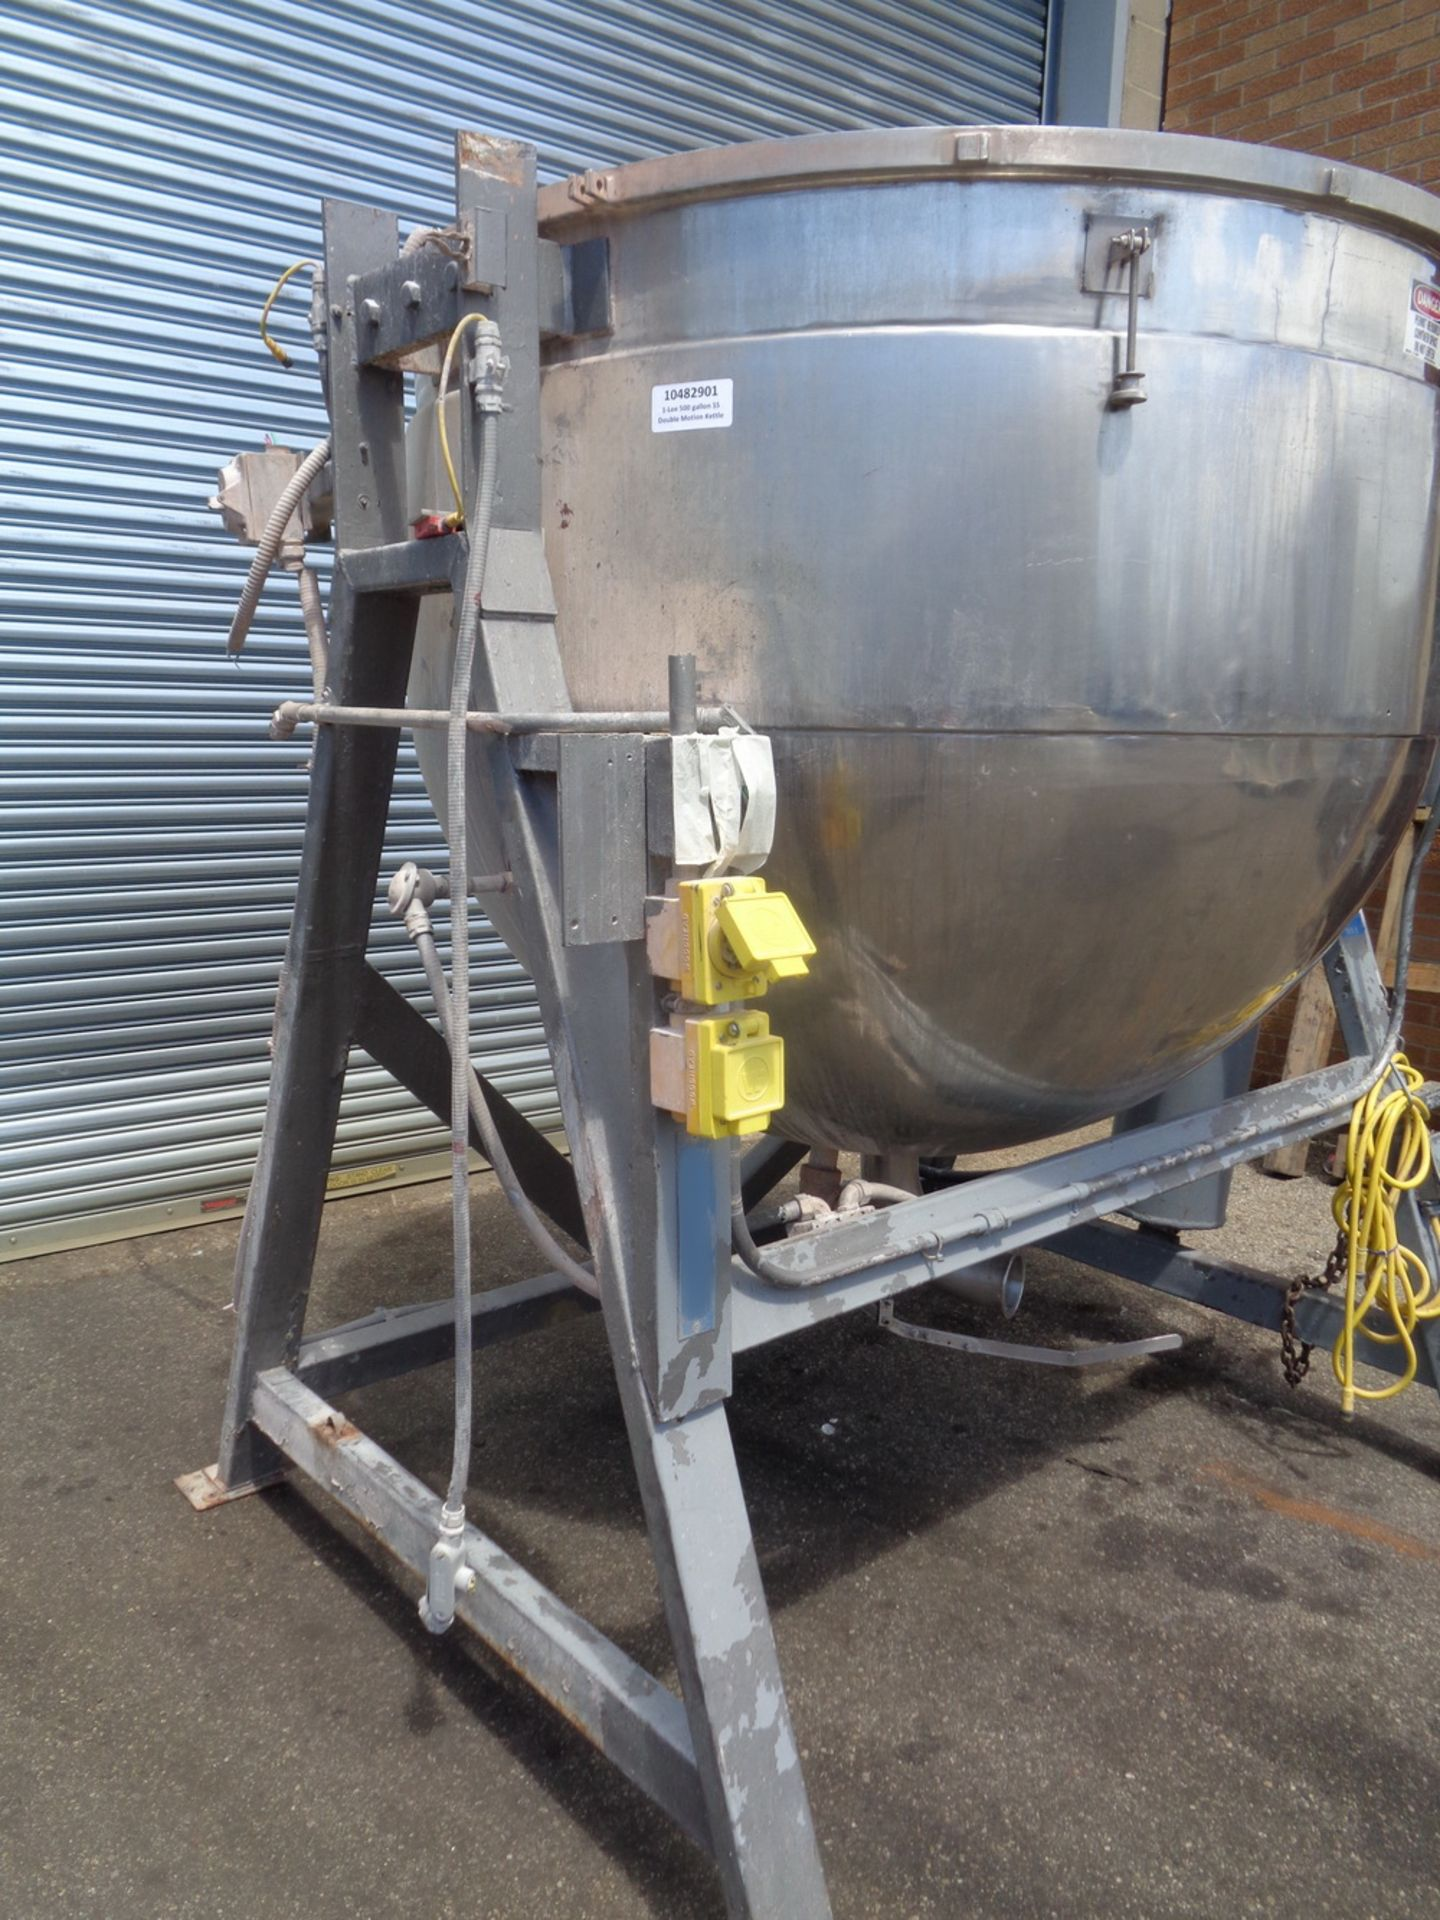 Lot 1 - Lee 500 gallon Stainless Steel Double Motion Scraper Jacketed Kettle, Model 500DV9MT